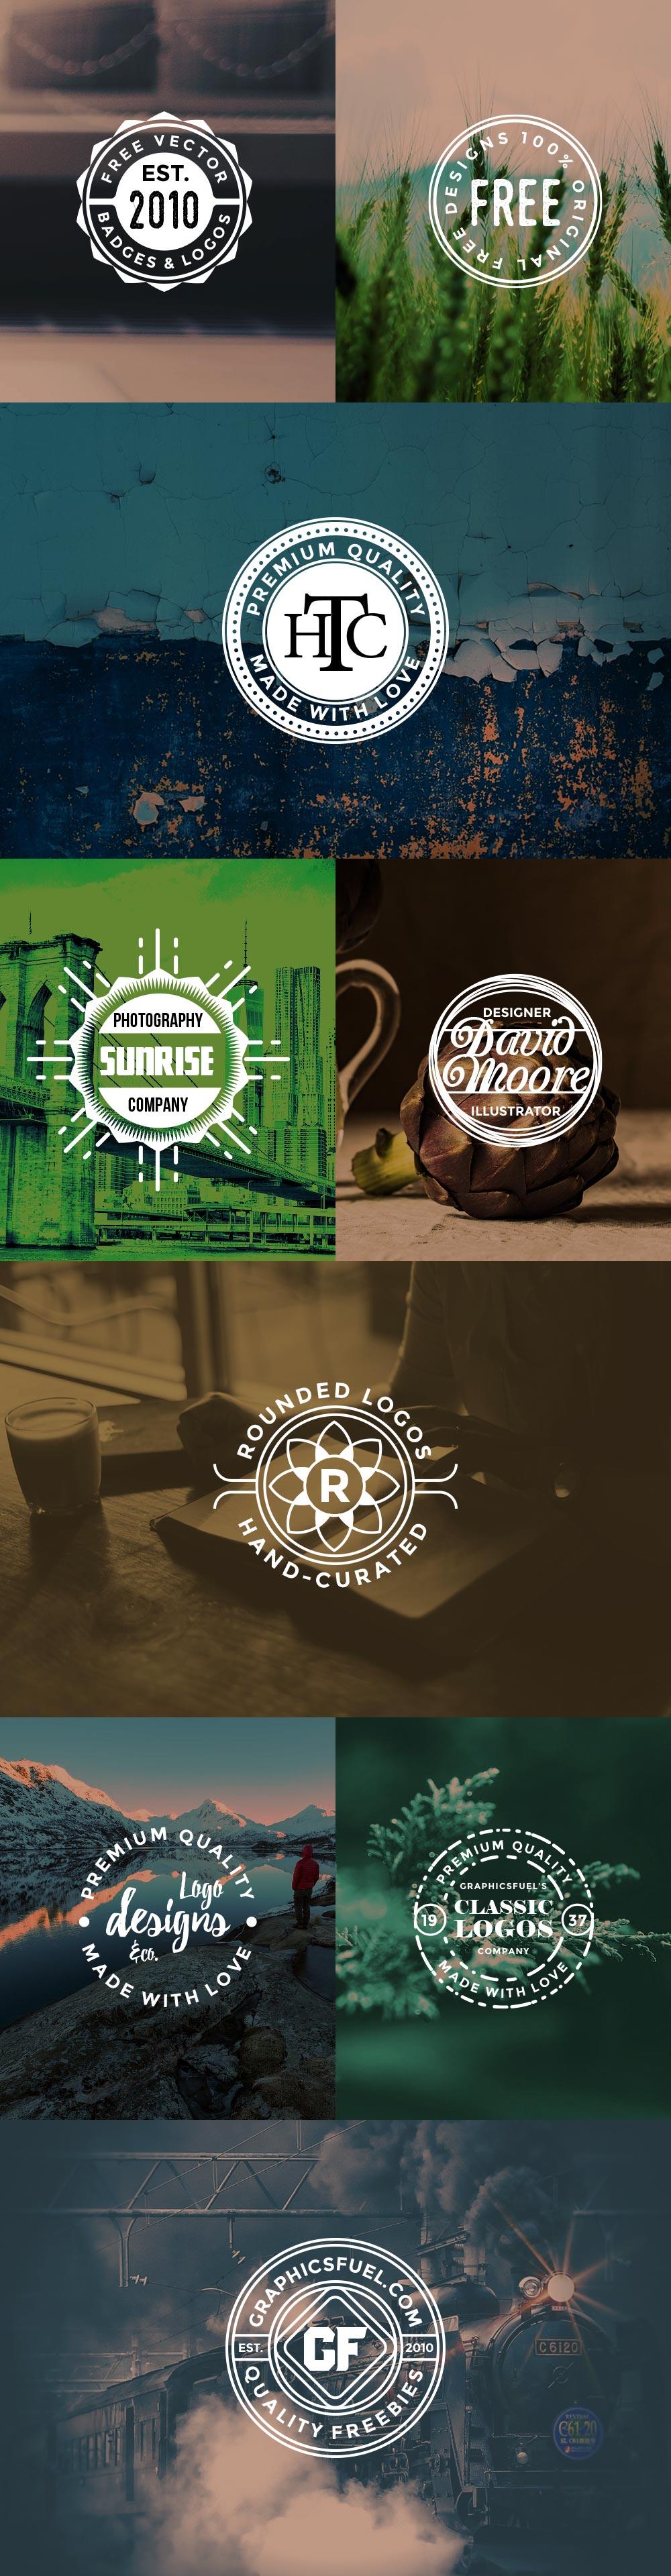 Vector Circular Logos Badges